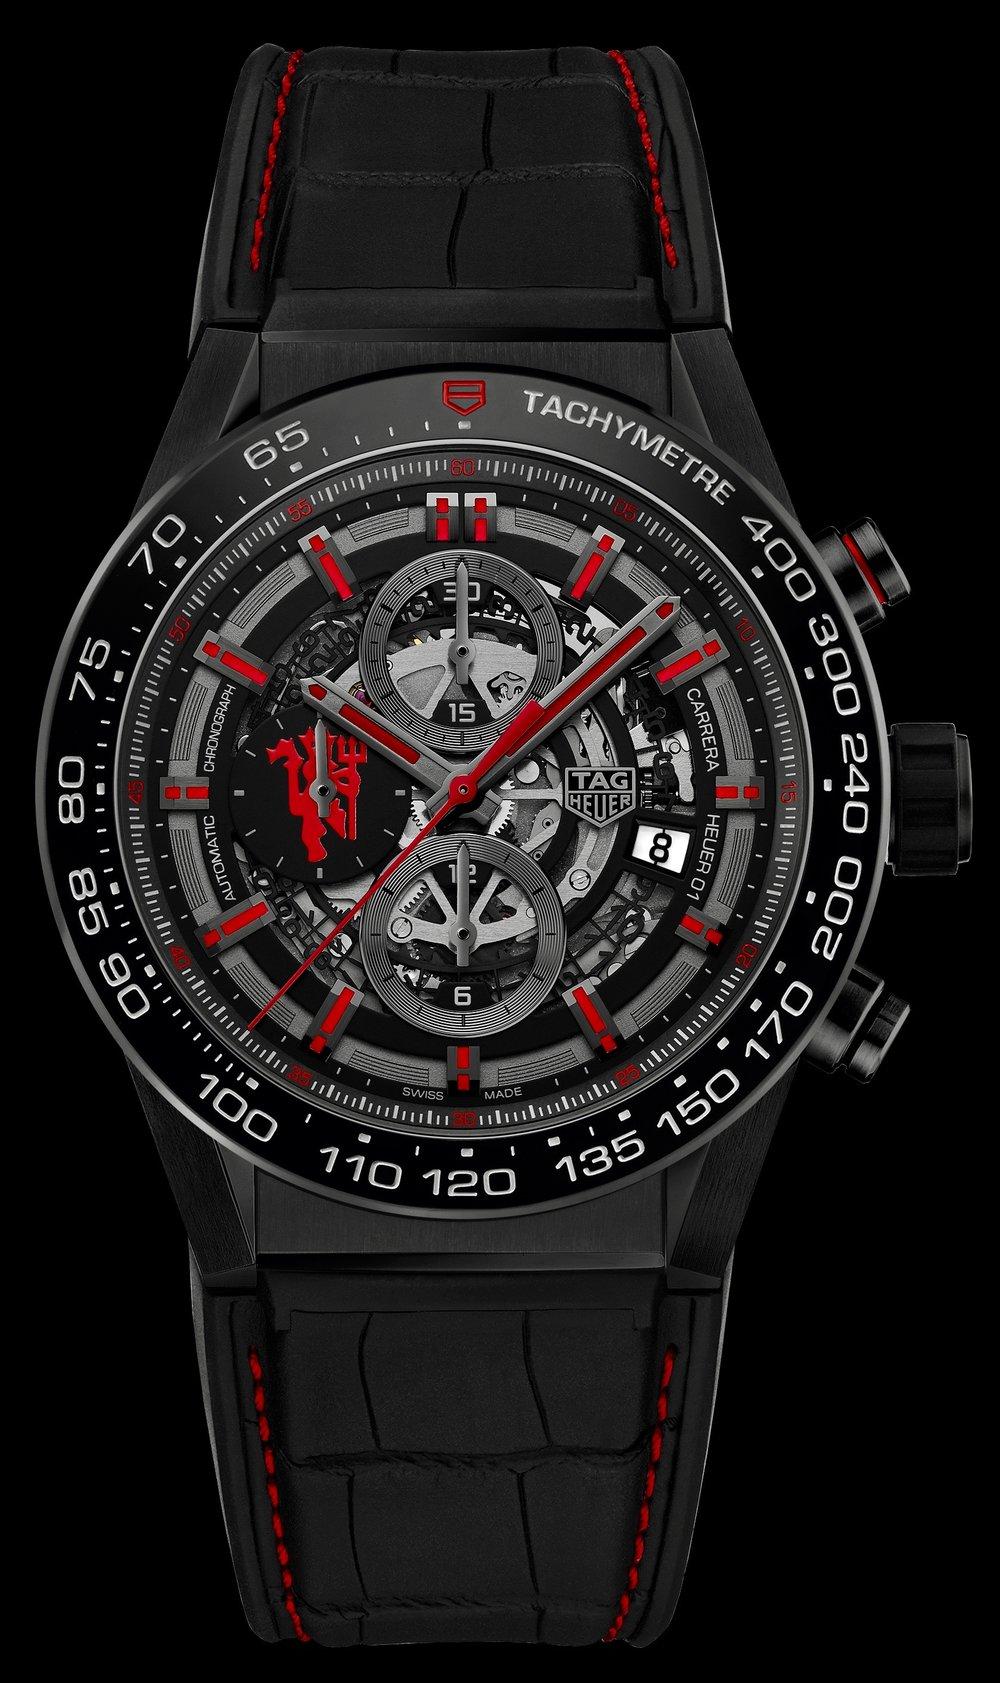 CAR2A1J.FC6400 SP HEUER 01 RED DEVIL 2017 HD fond noir.jpg